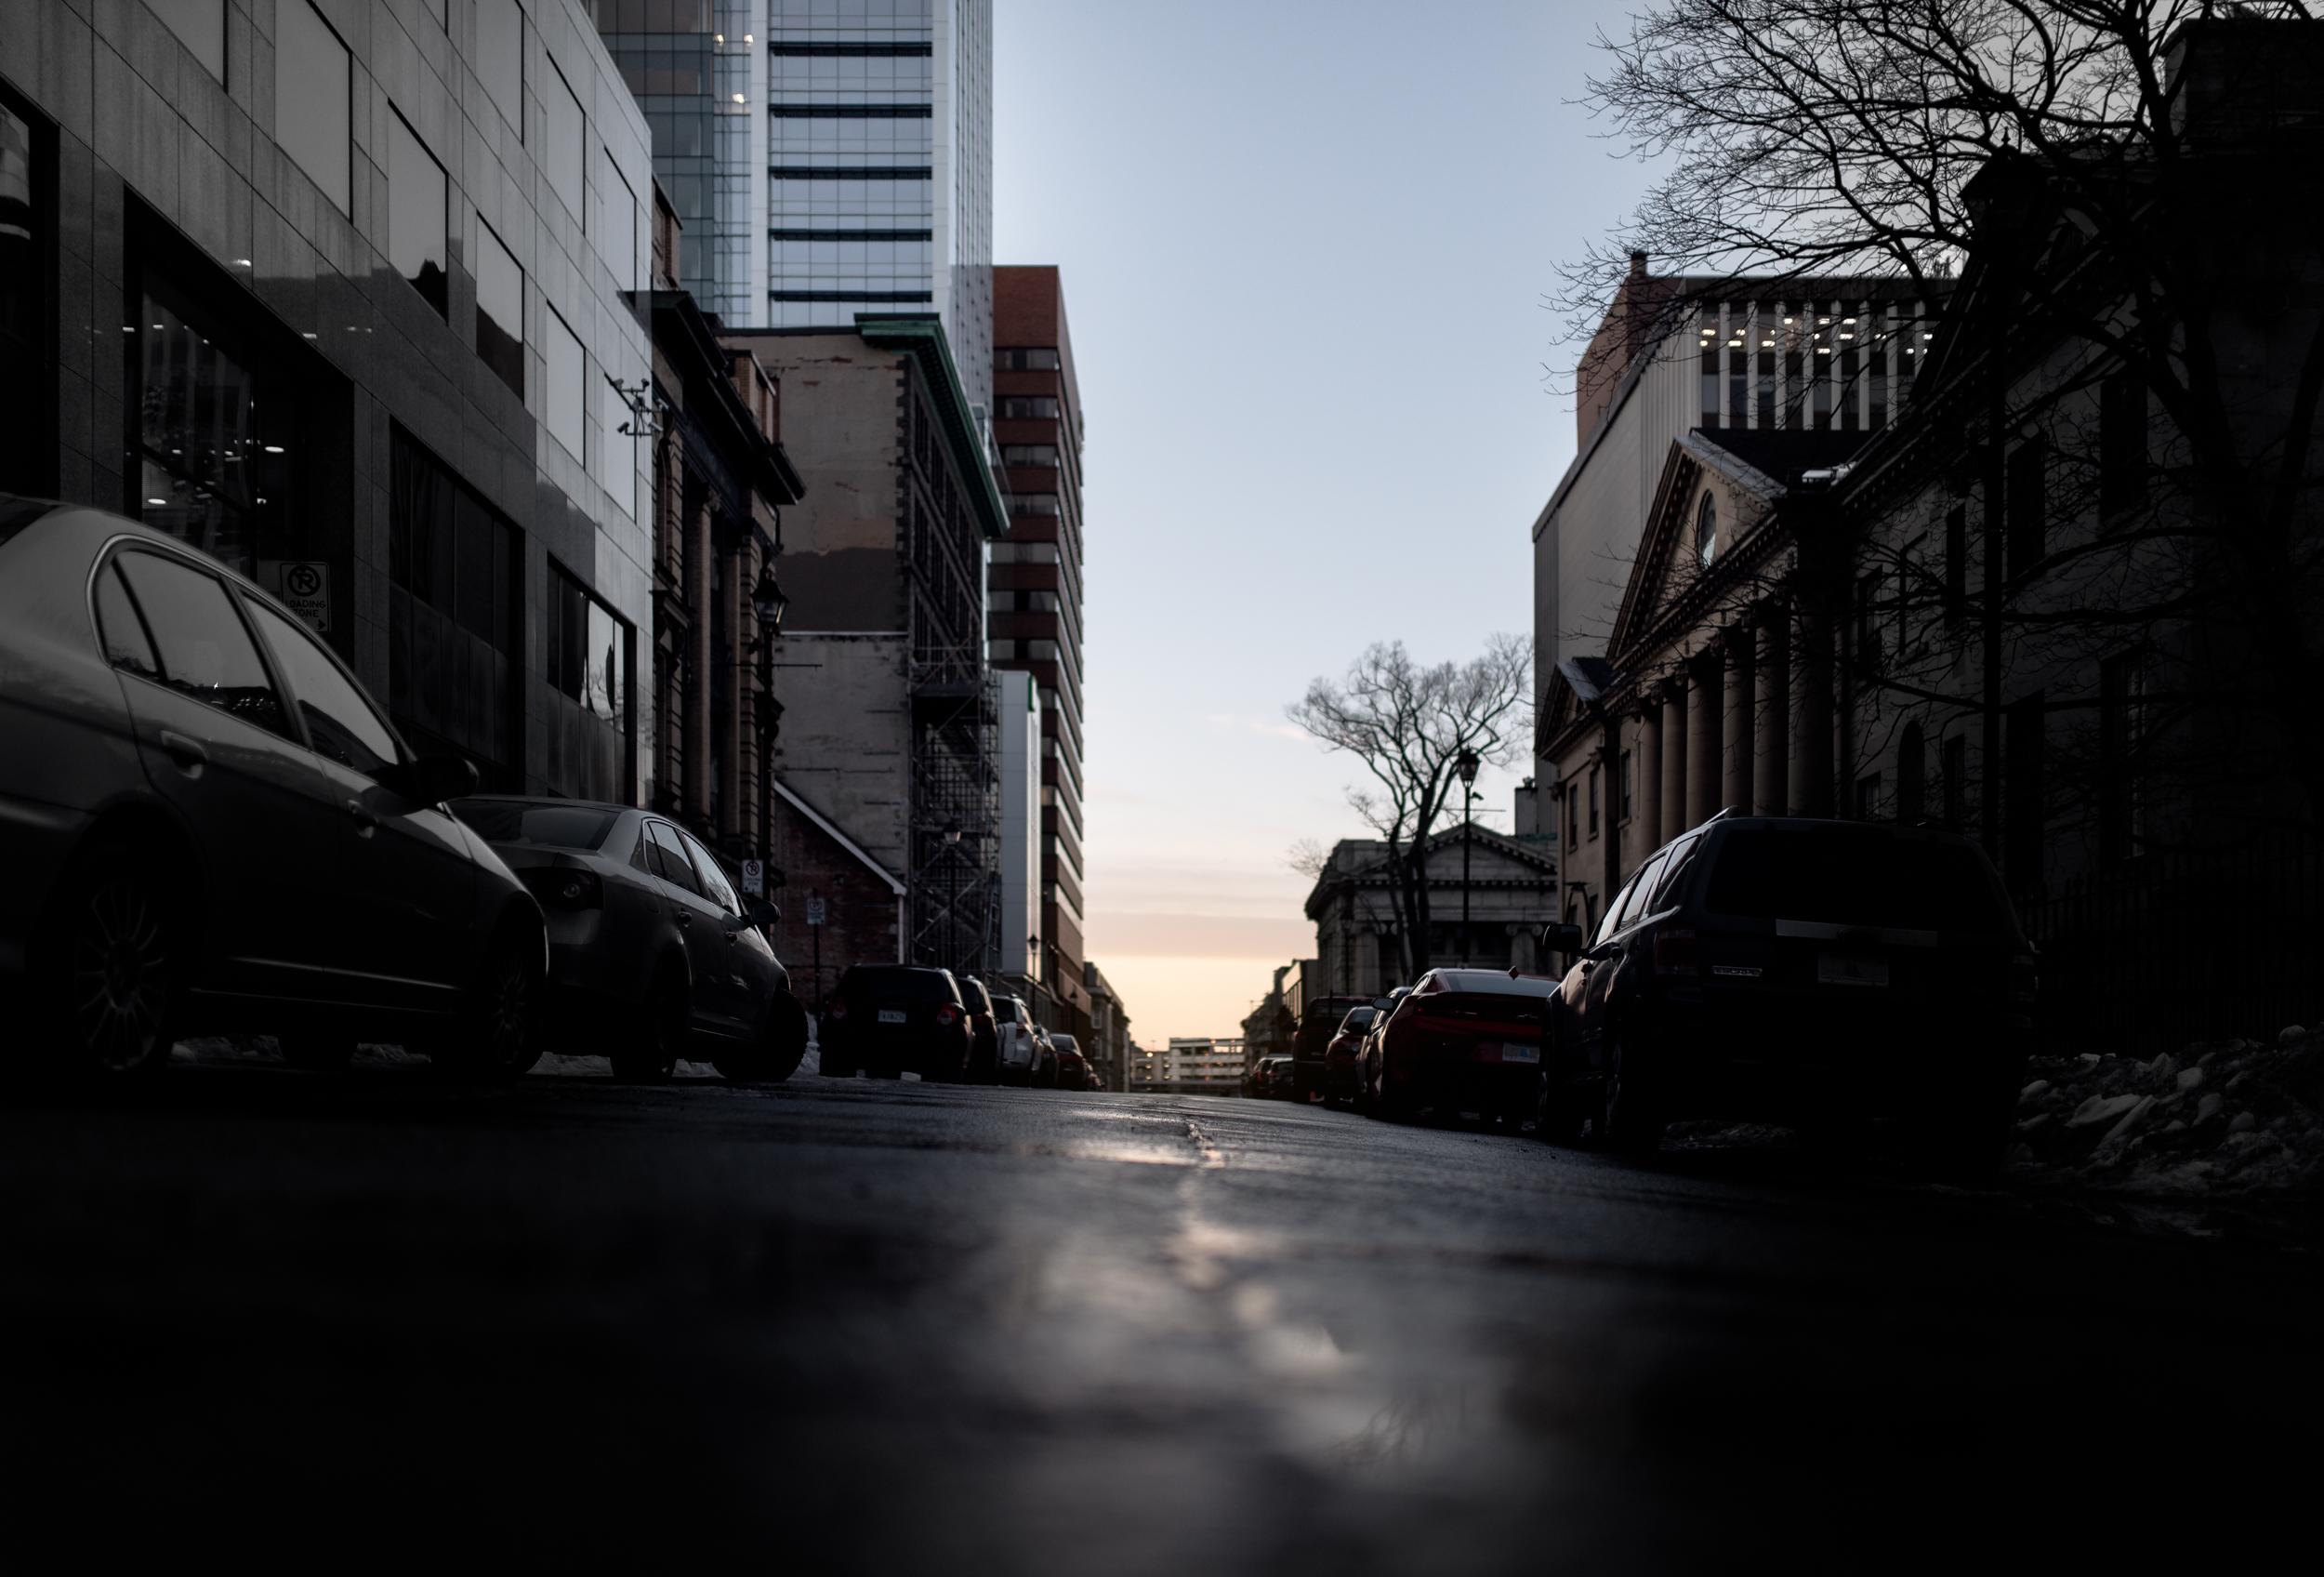 Fraser Photography | Halifax, Nova Scotia